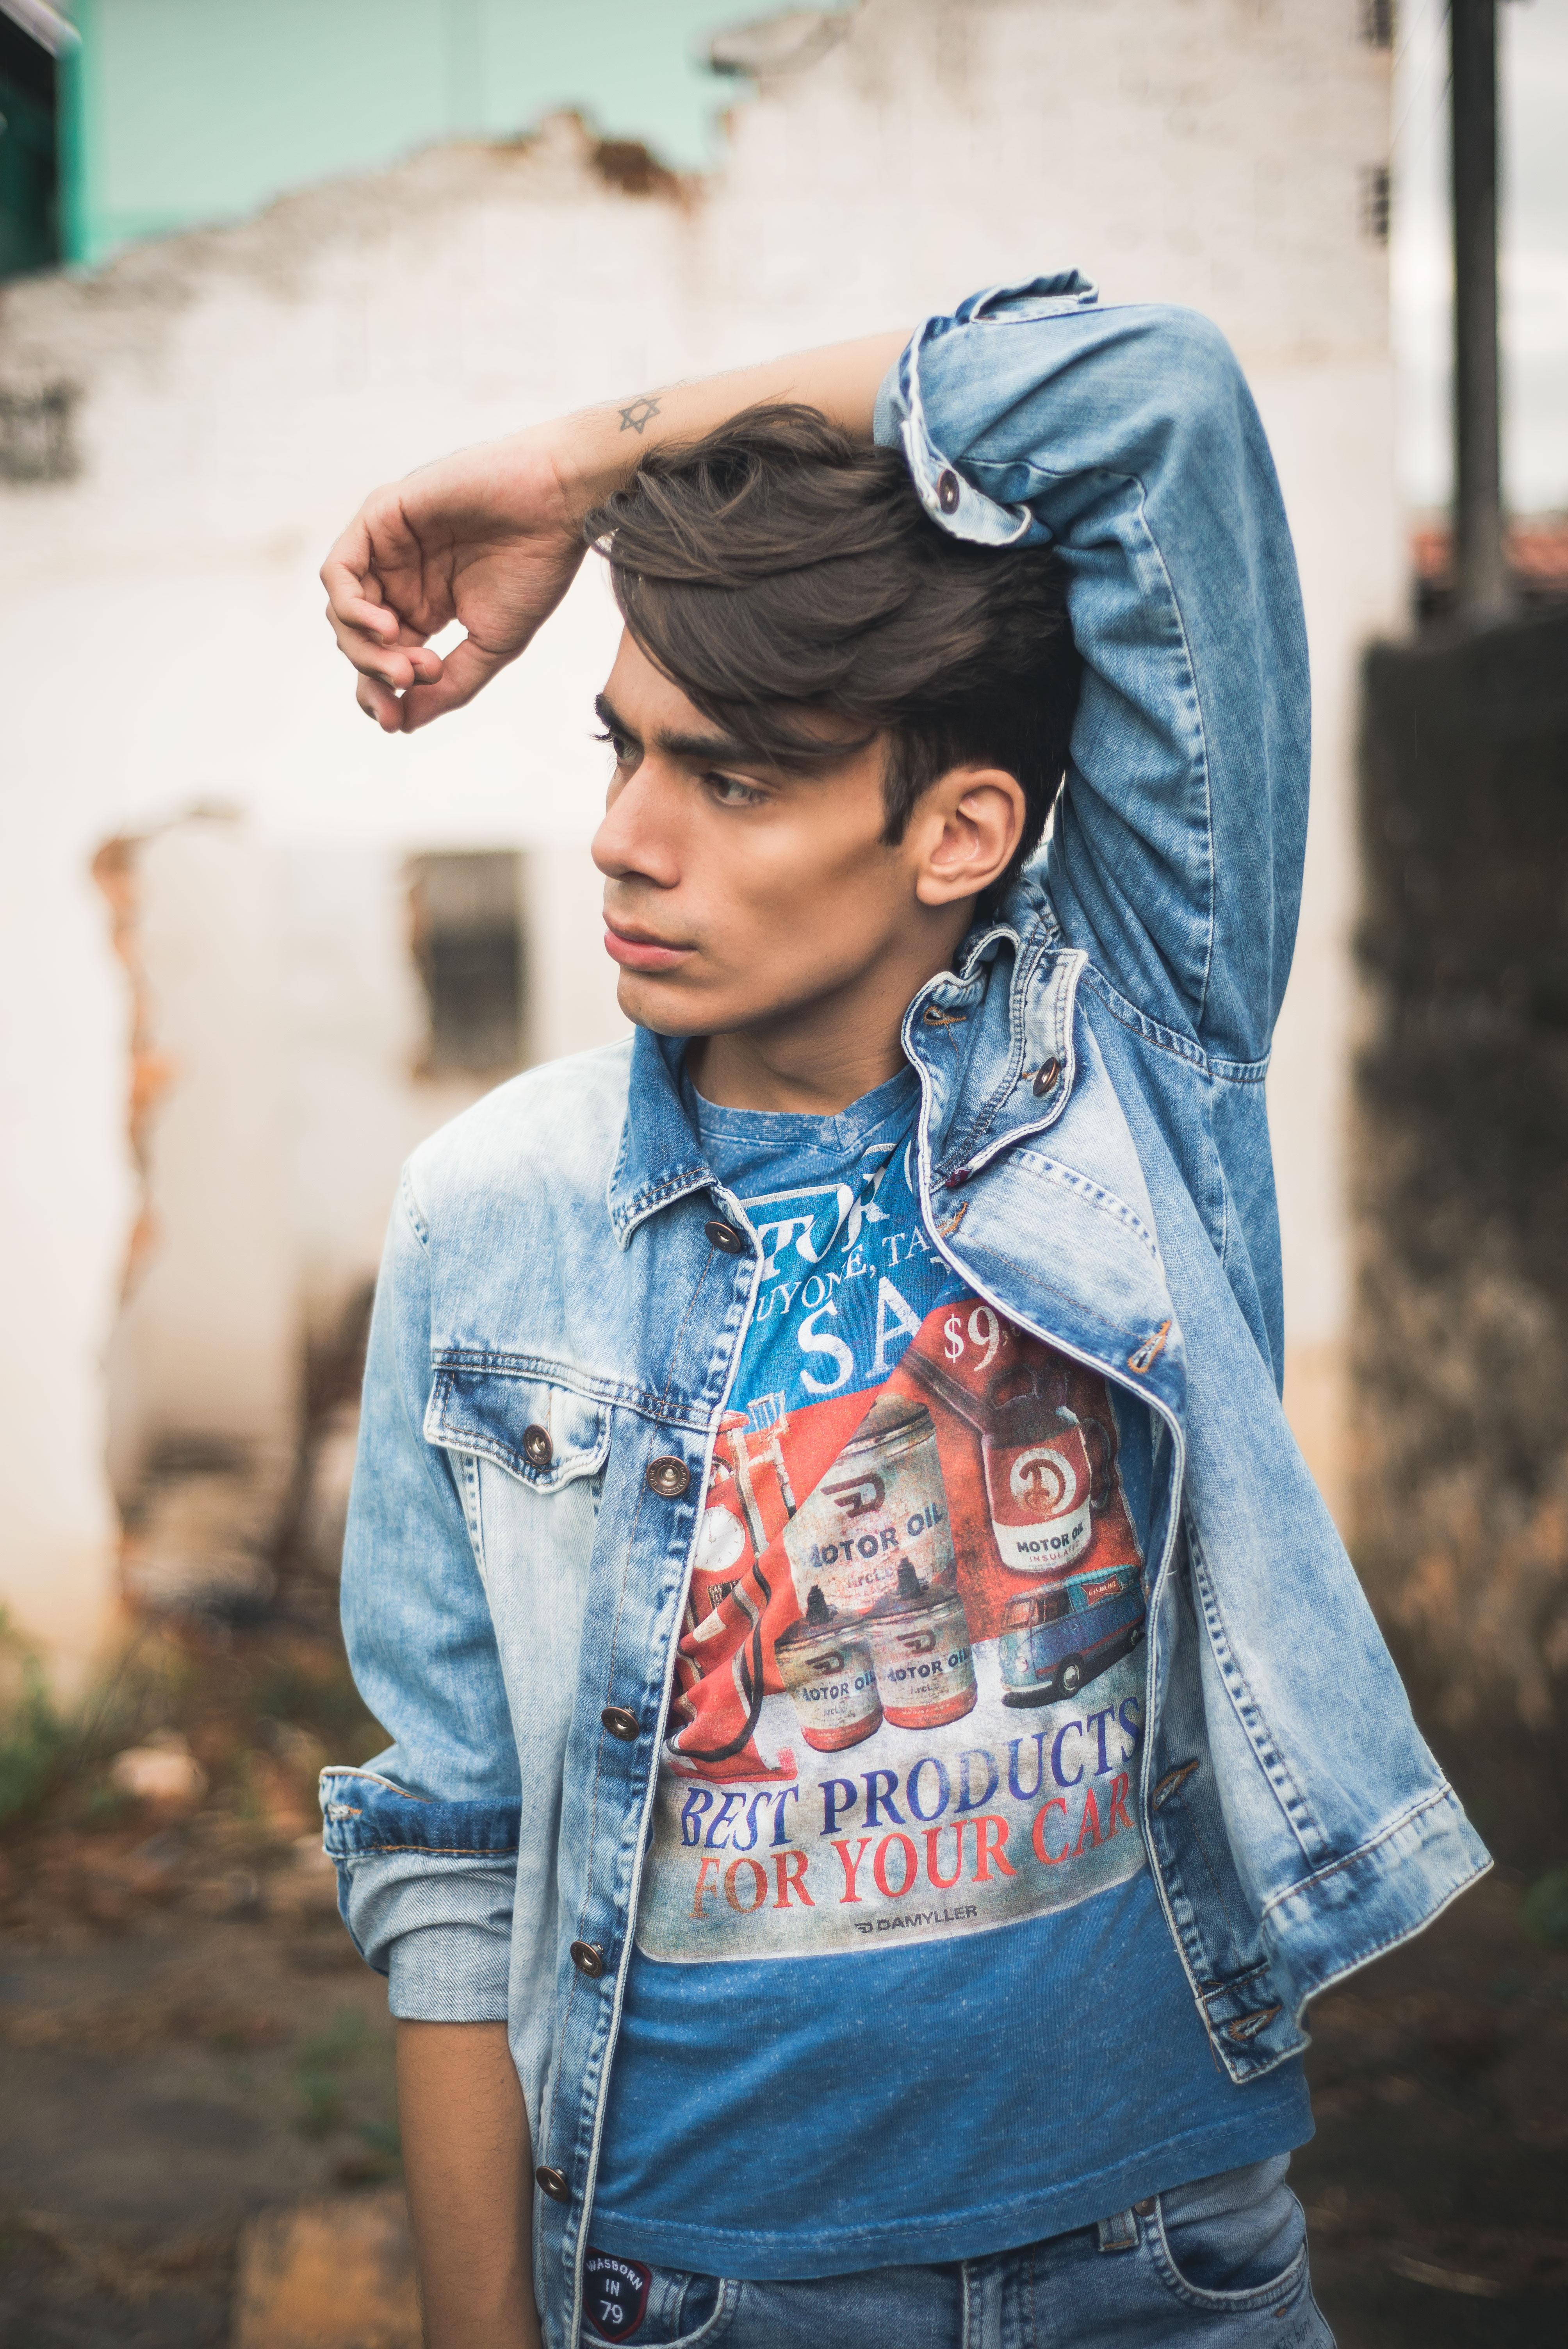 alex cursino, blogueiro de moda, blog de moda masculina, digital influencer, canal de moda, jaqueta jeans, calça jeans, damyller, mens, menswear, style, (7)